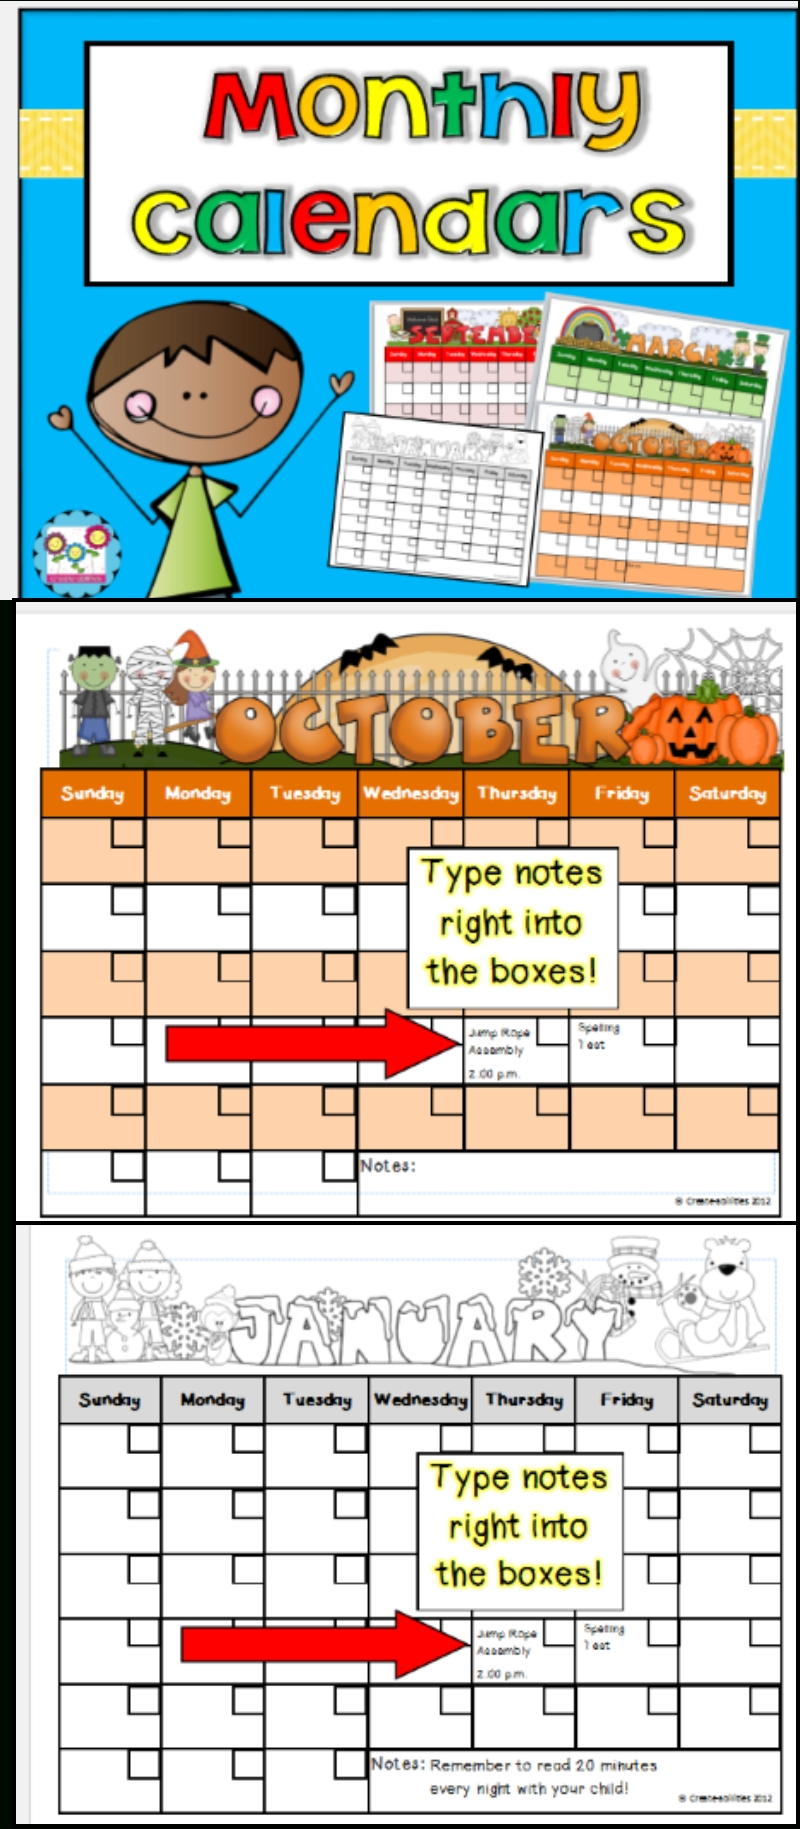 Monthly Calendar Templates Editable | Classroom Calendar